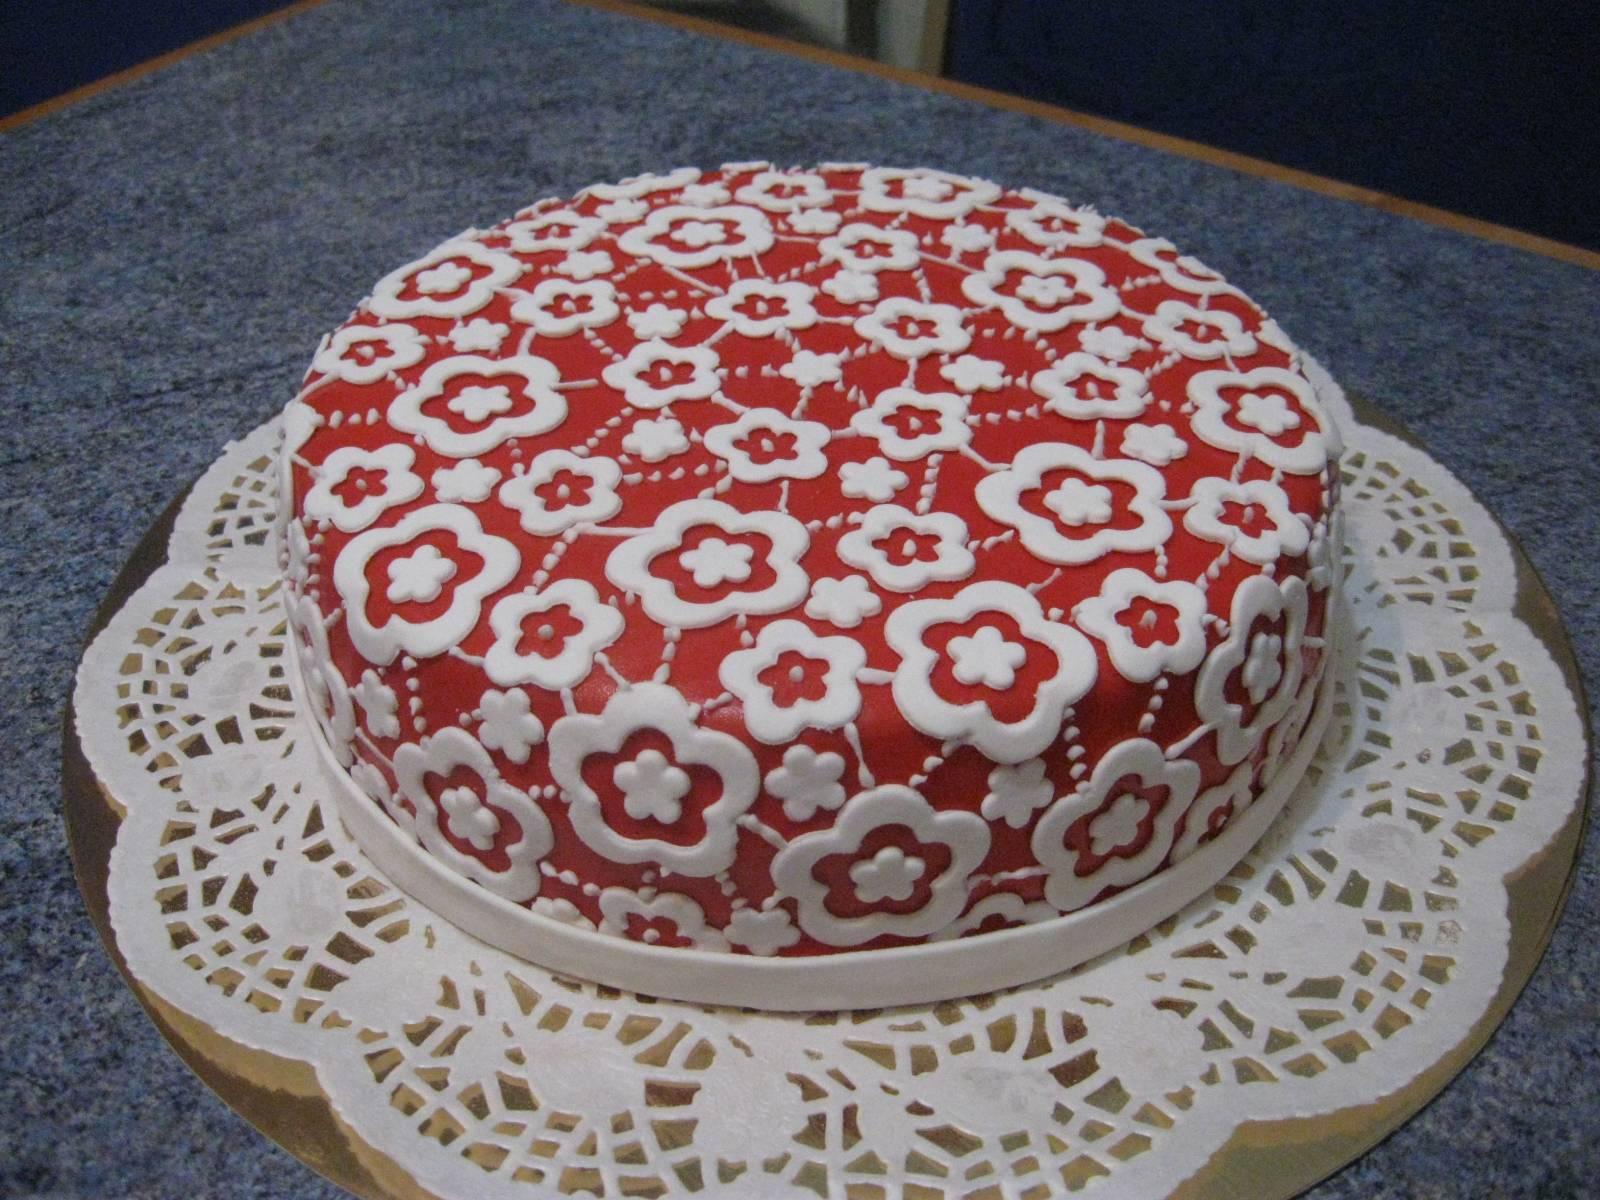 Кружево на торте в домашних условиях